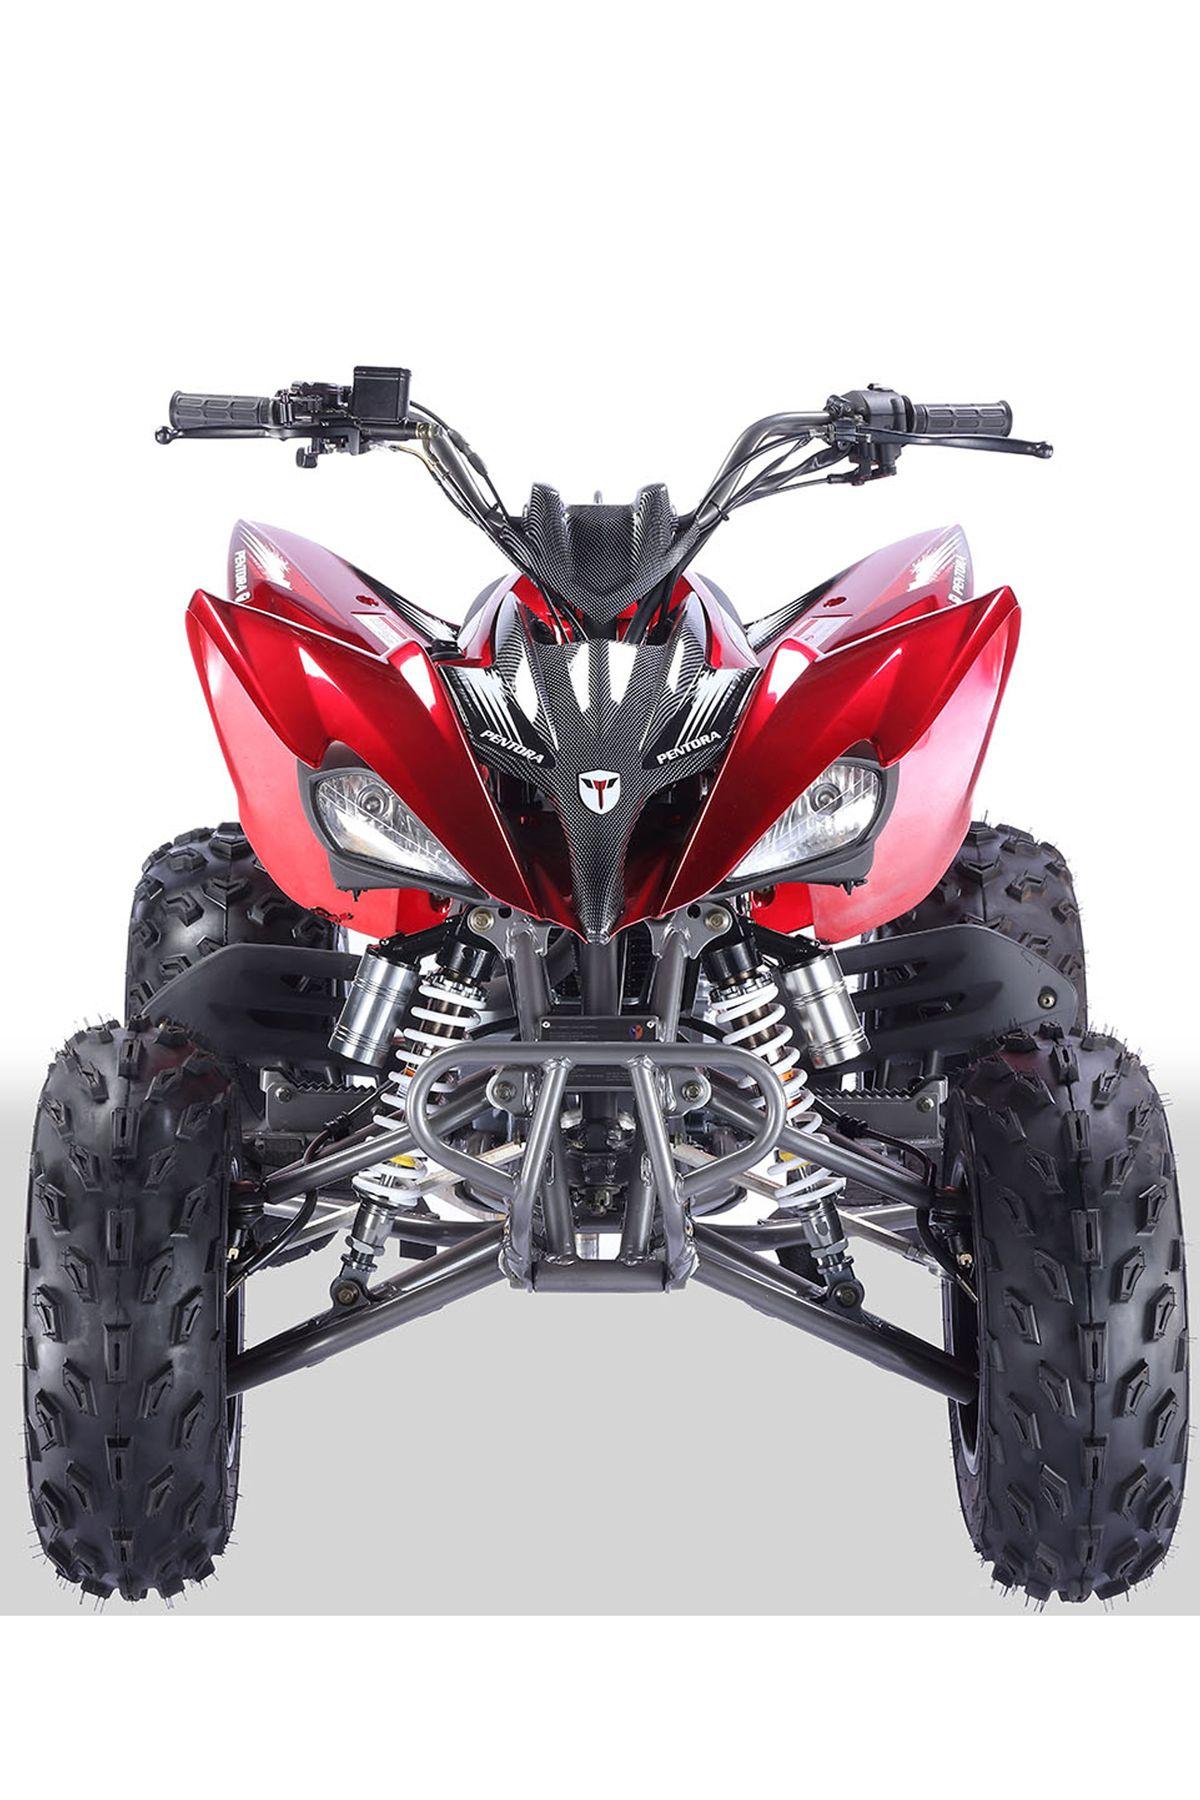 Atv G026 Vitacci Pentora 250cc Racing Atv Quad 4 Wheeler With